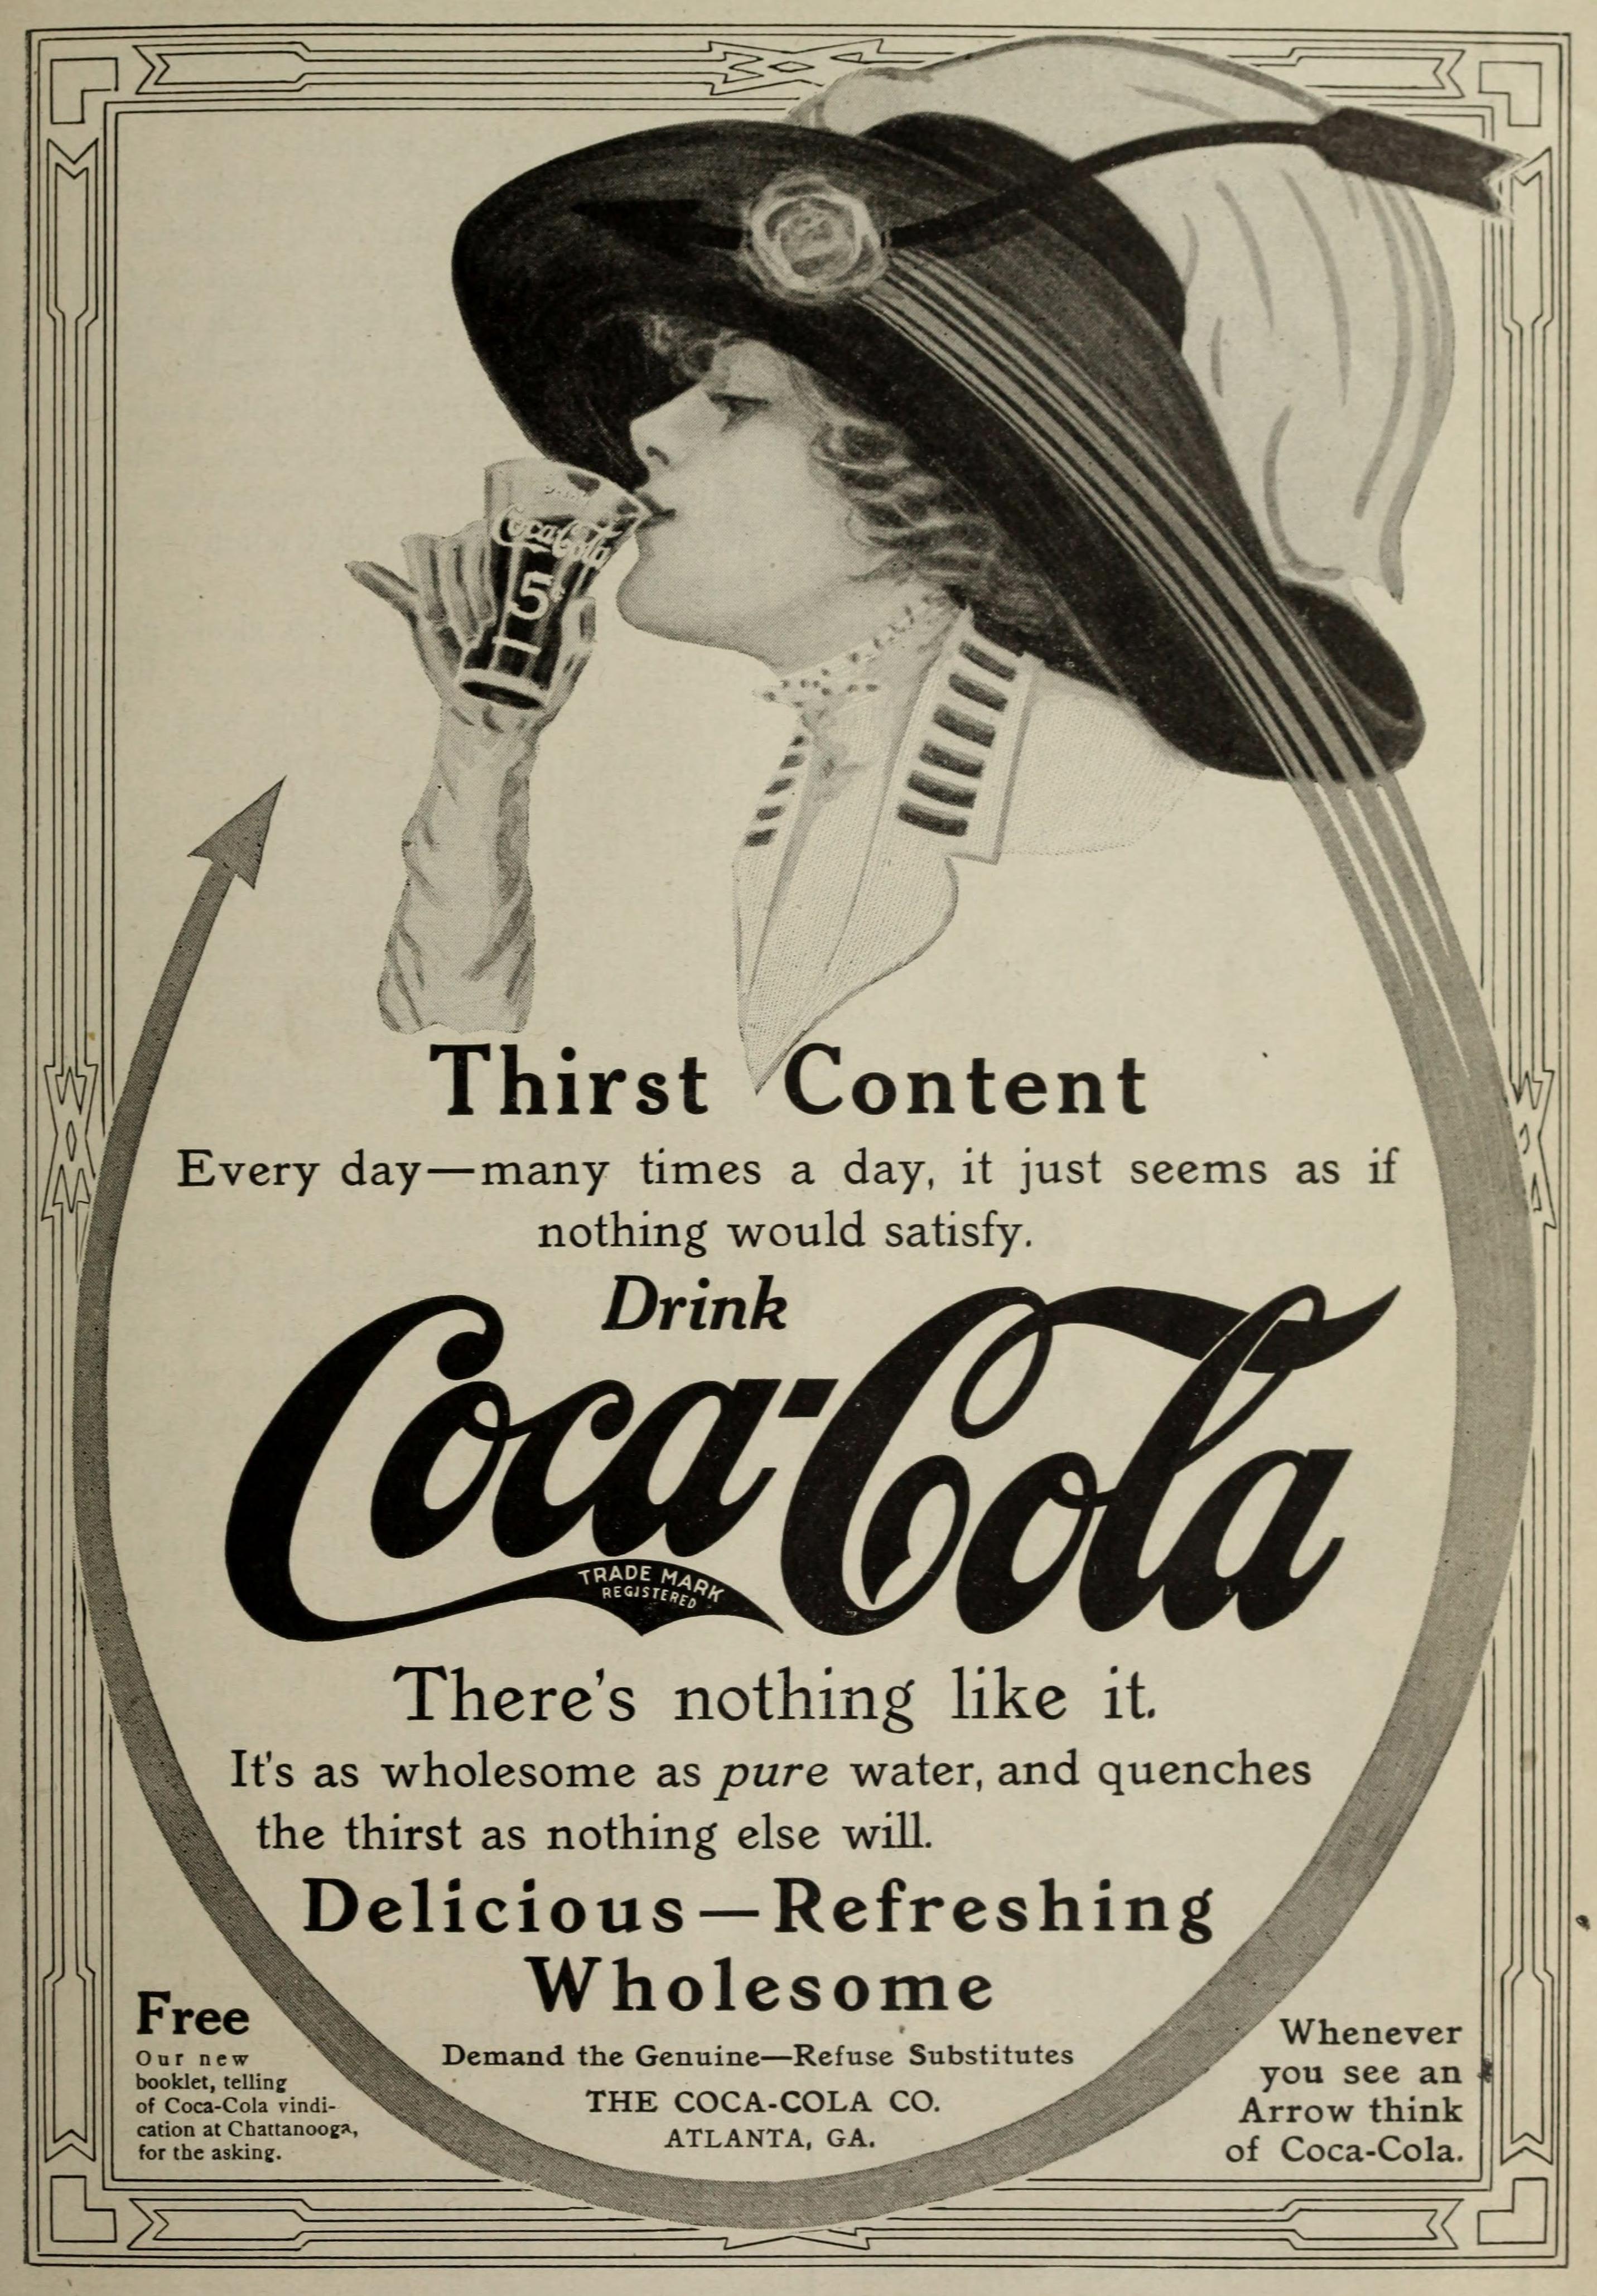 Coca-Cola Ad circa 1911 - Woman Enjoying Coke Wearing a Lovely Hat